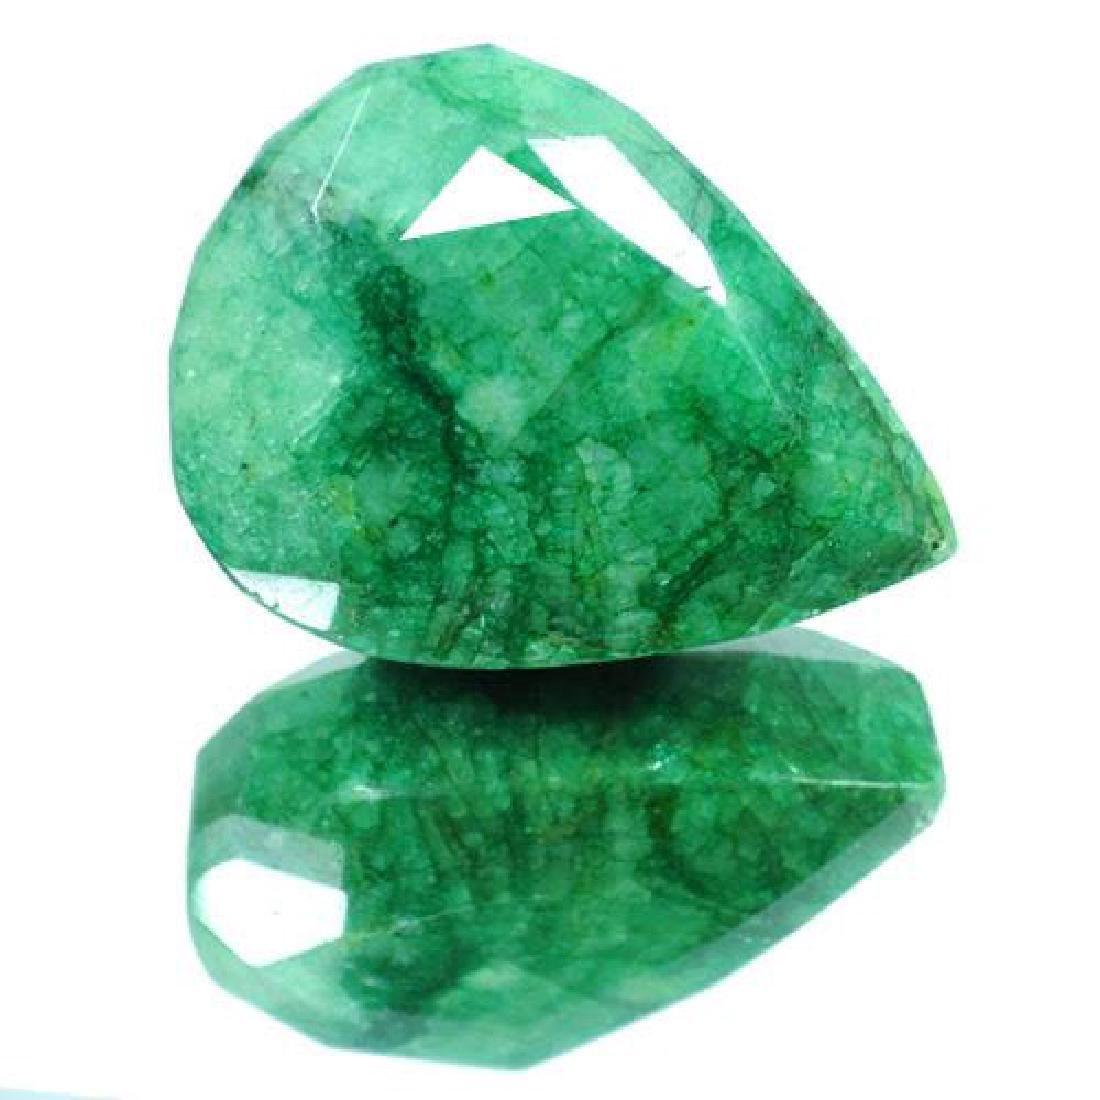 183.40 Carat Loose Emerald, KGCL Cert